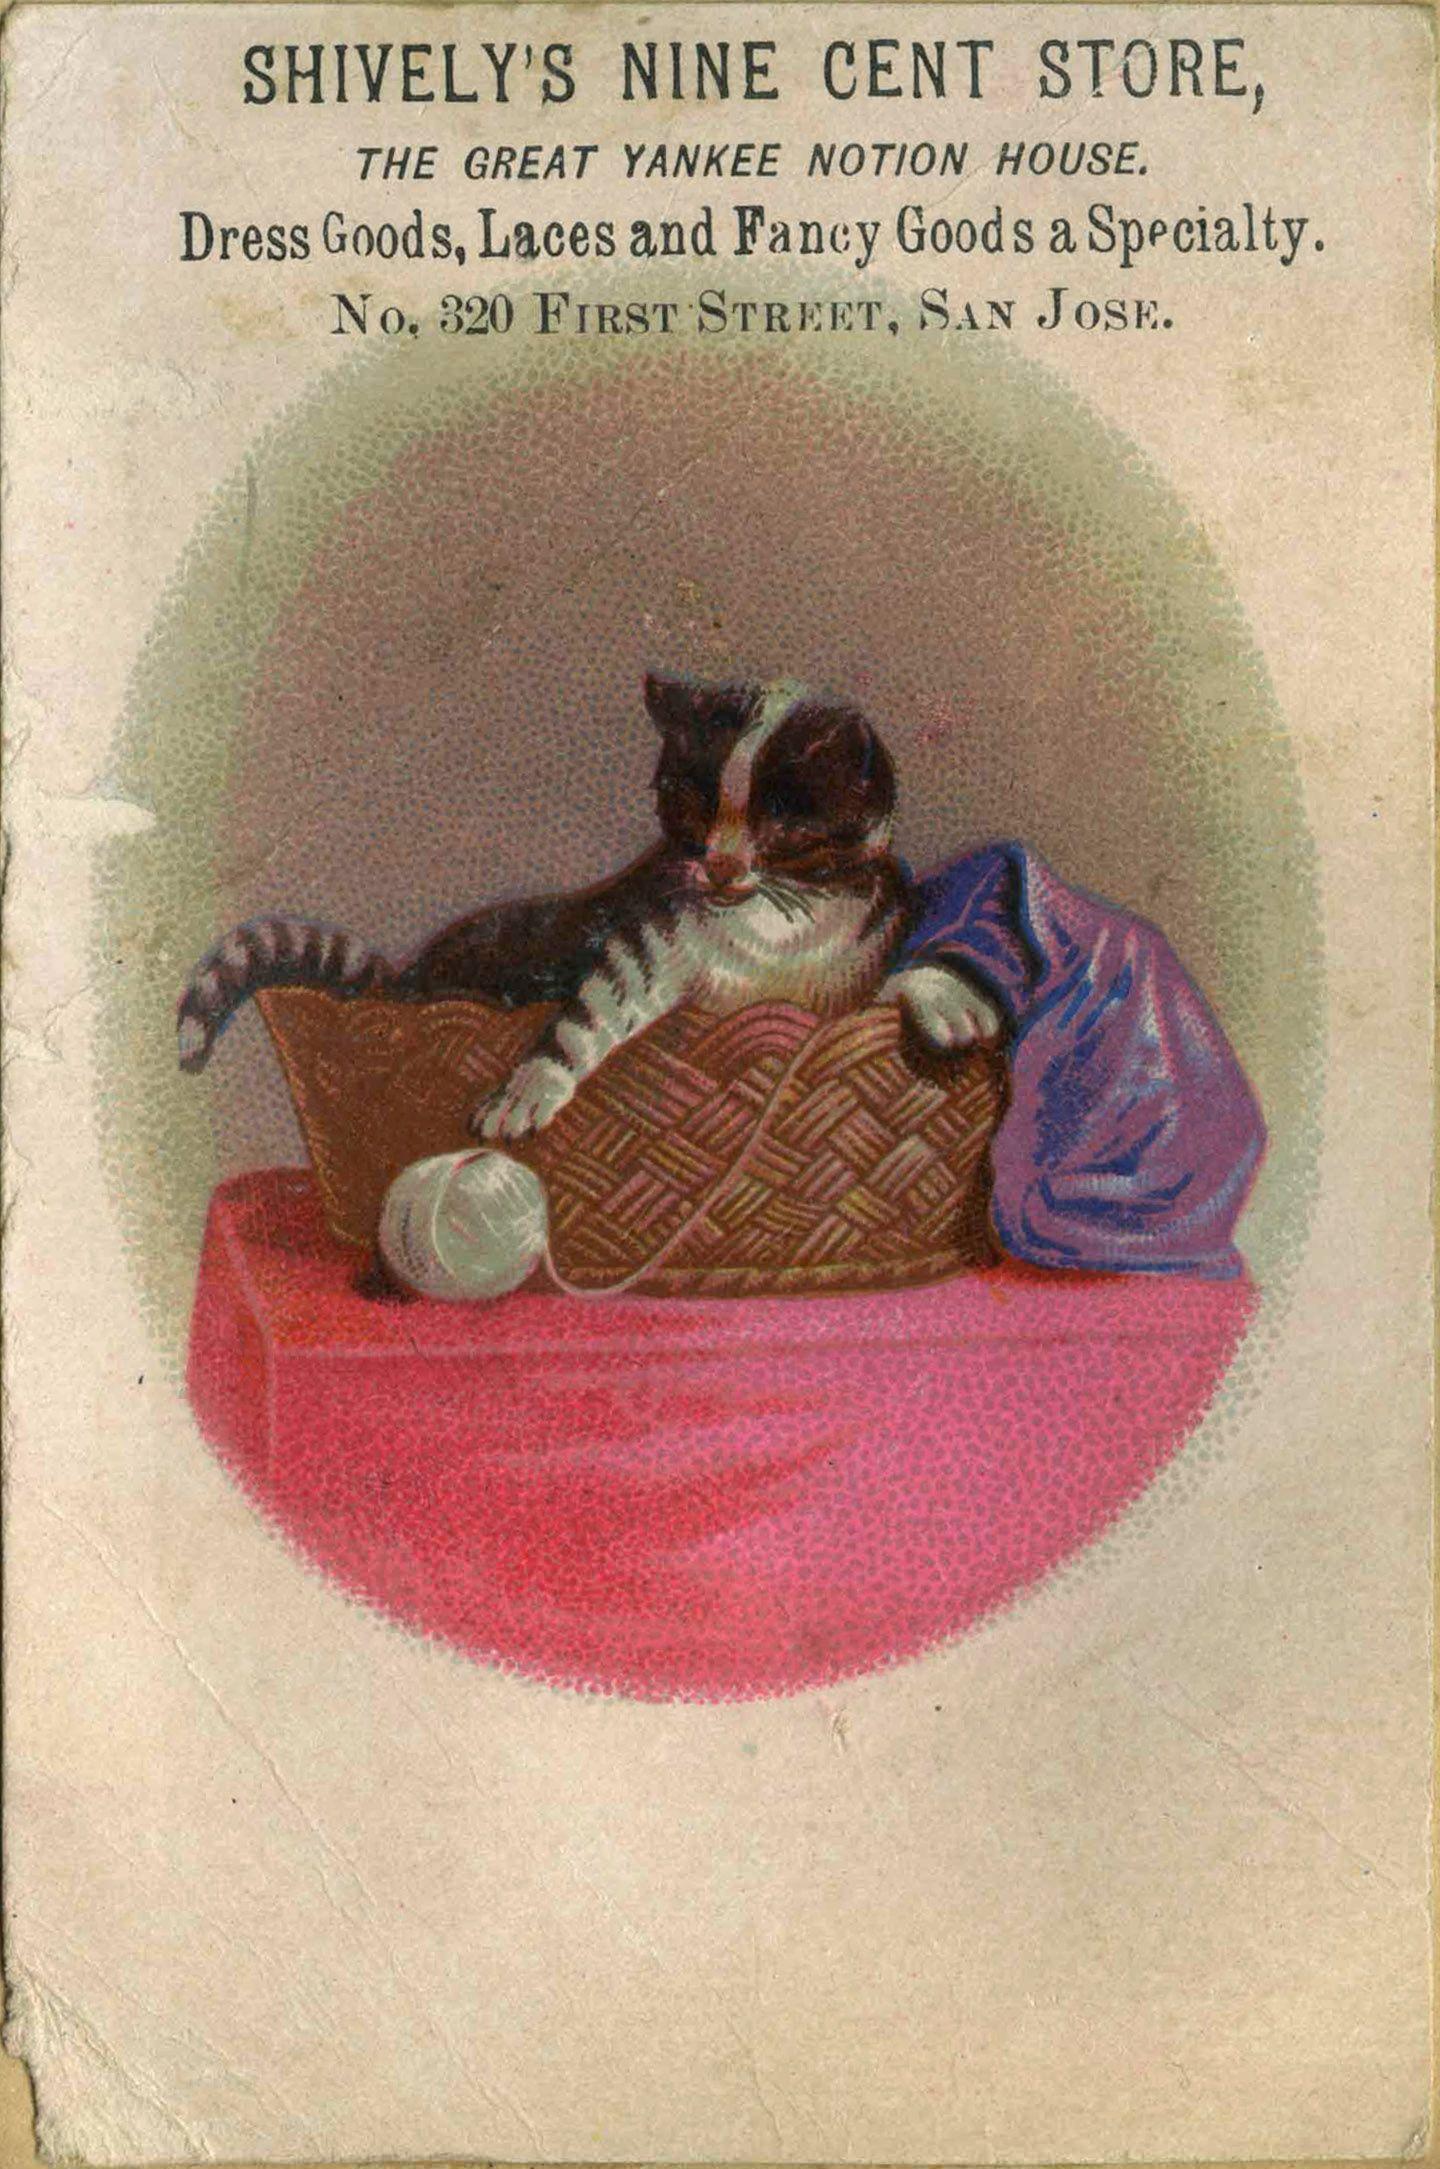 1880s Scrapbook Of Advertisements And Illustrations Kitten And Yarn California Room Illustration Scrapbook